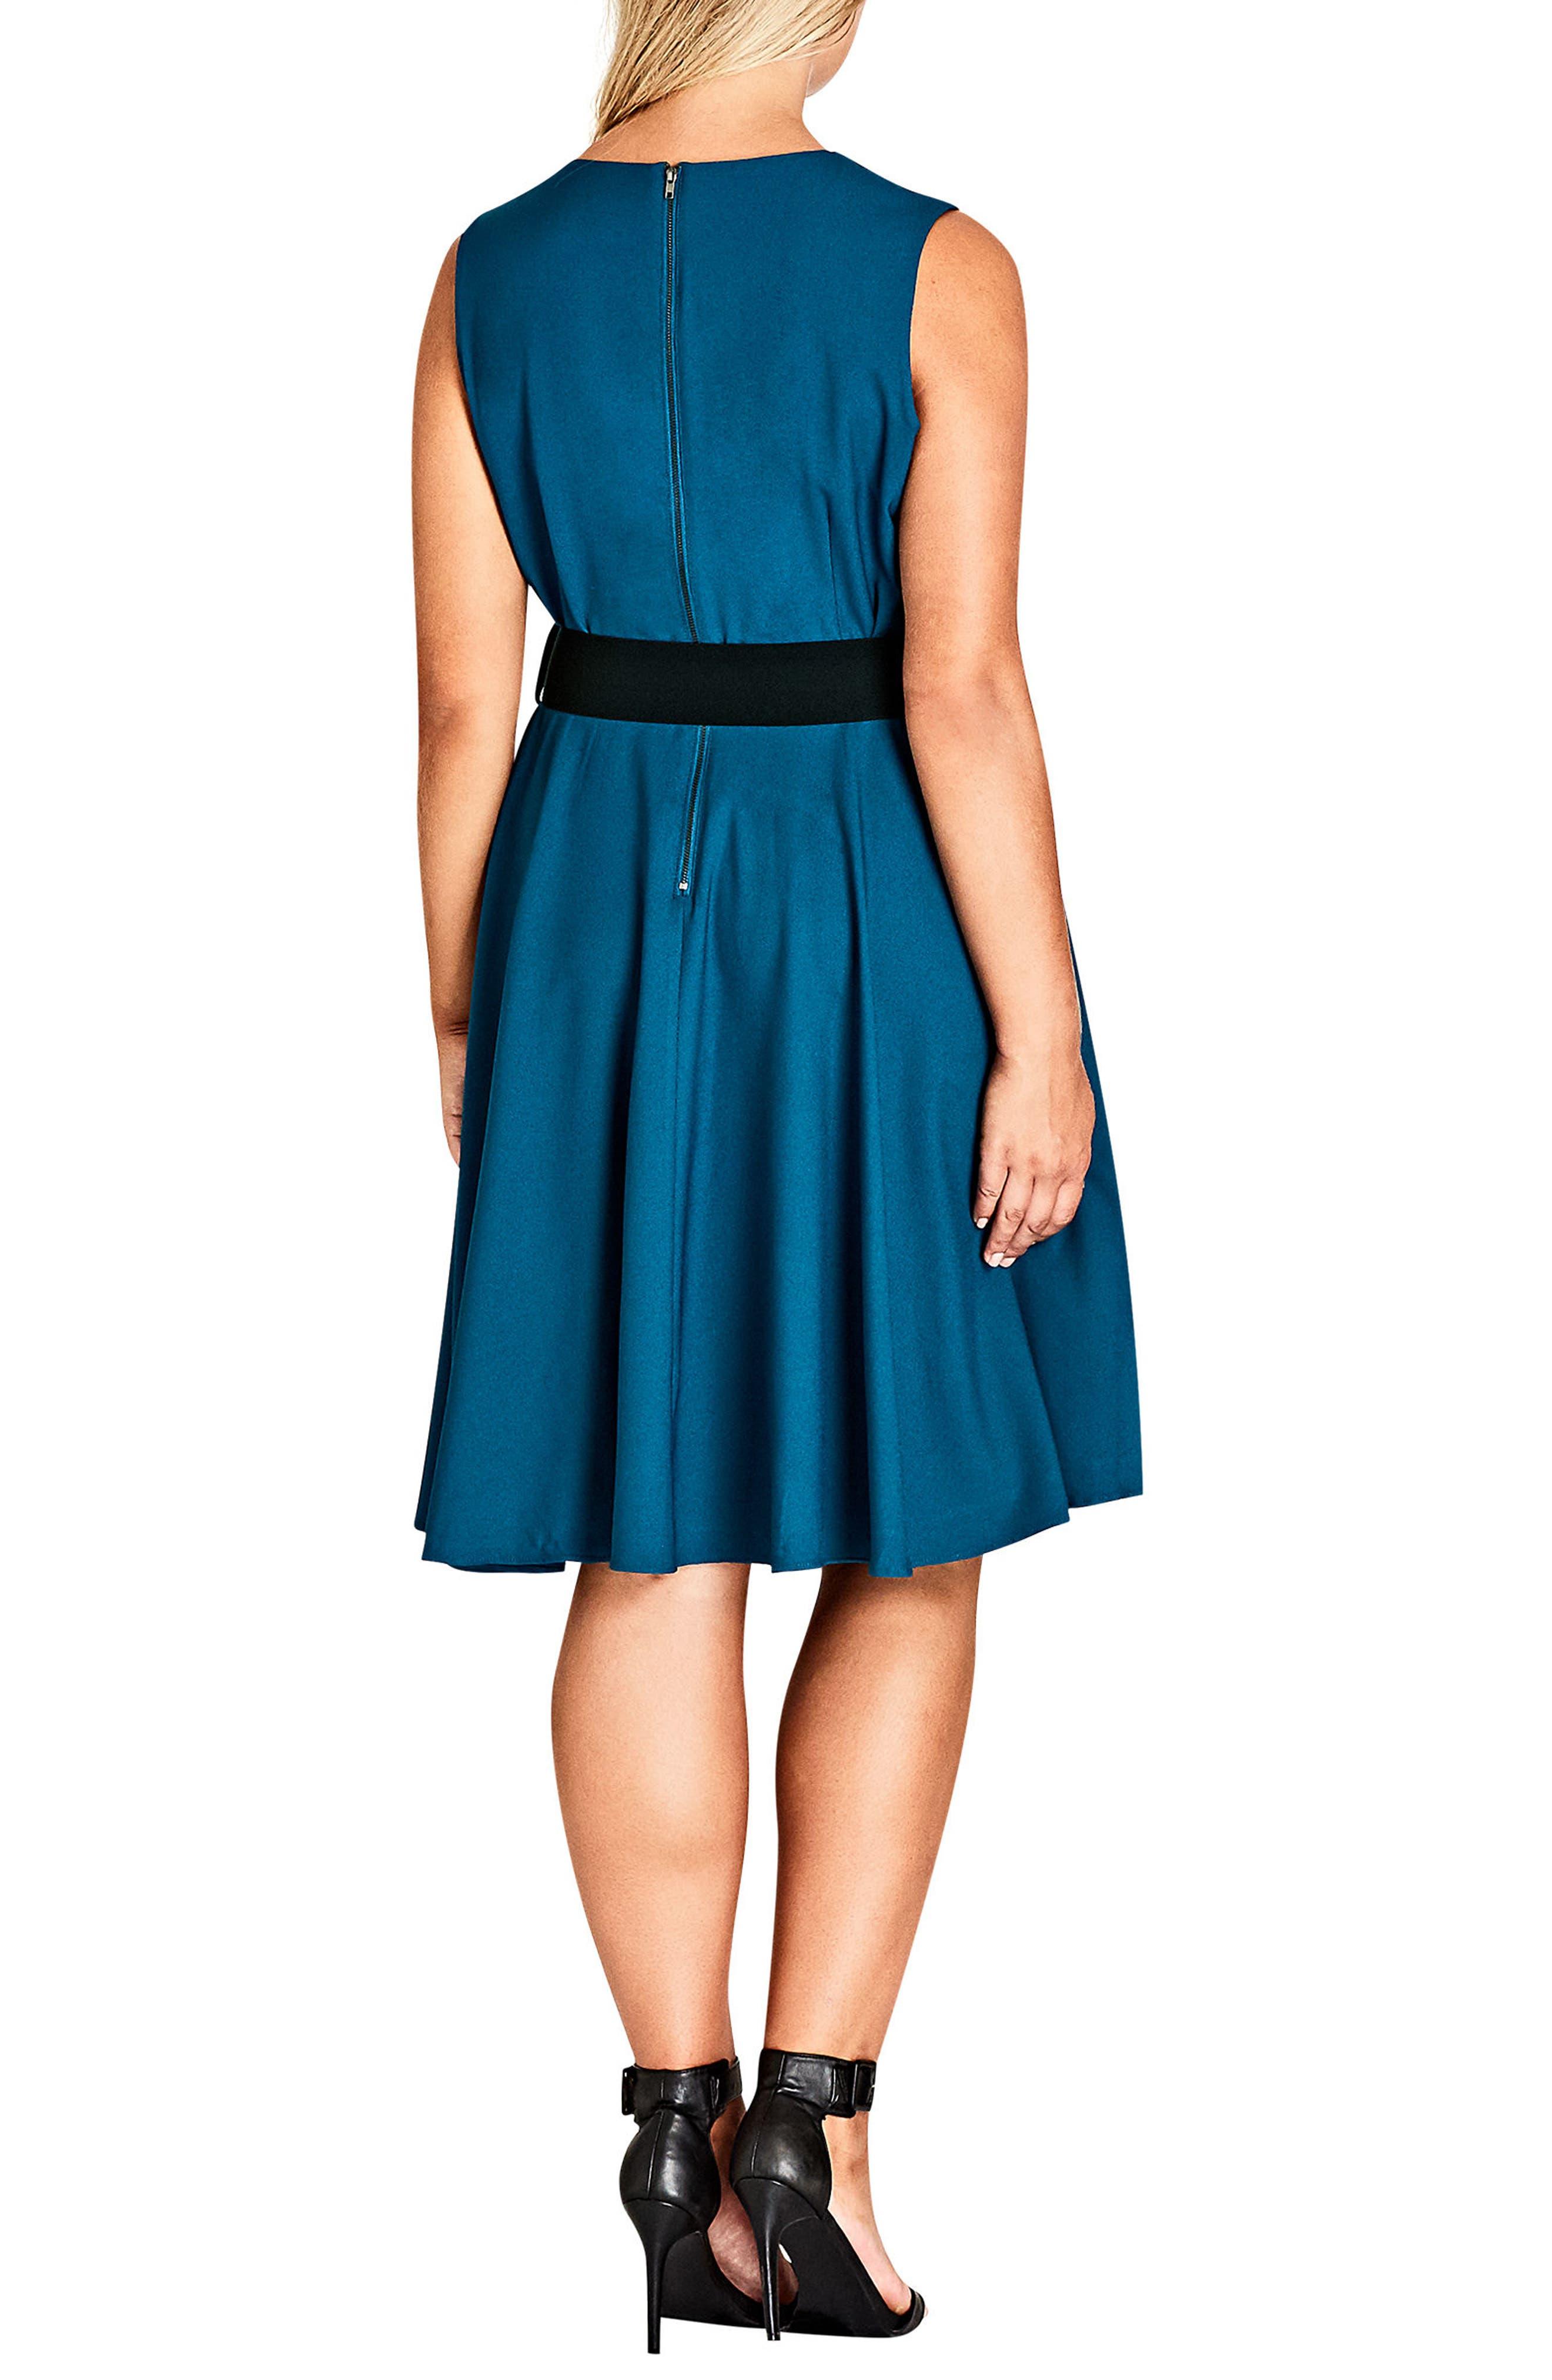 Vintage Veronica Belted Pleat Fit & Flare Dress,                             Alternate thumbnail 2, color,                             TEAL